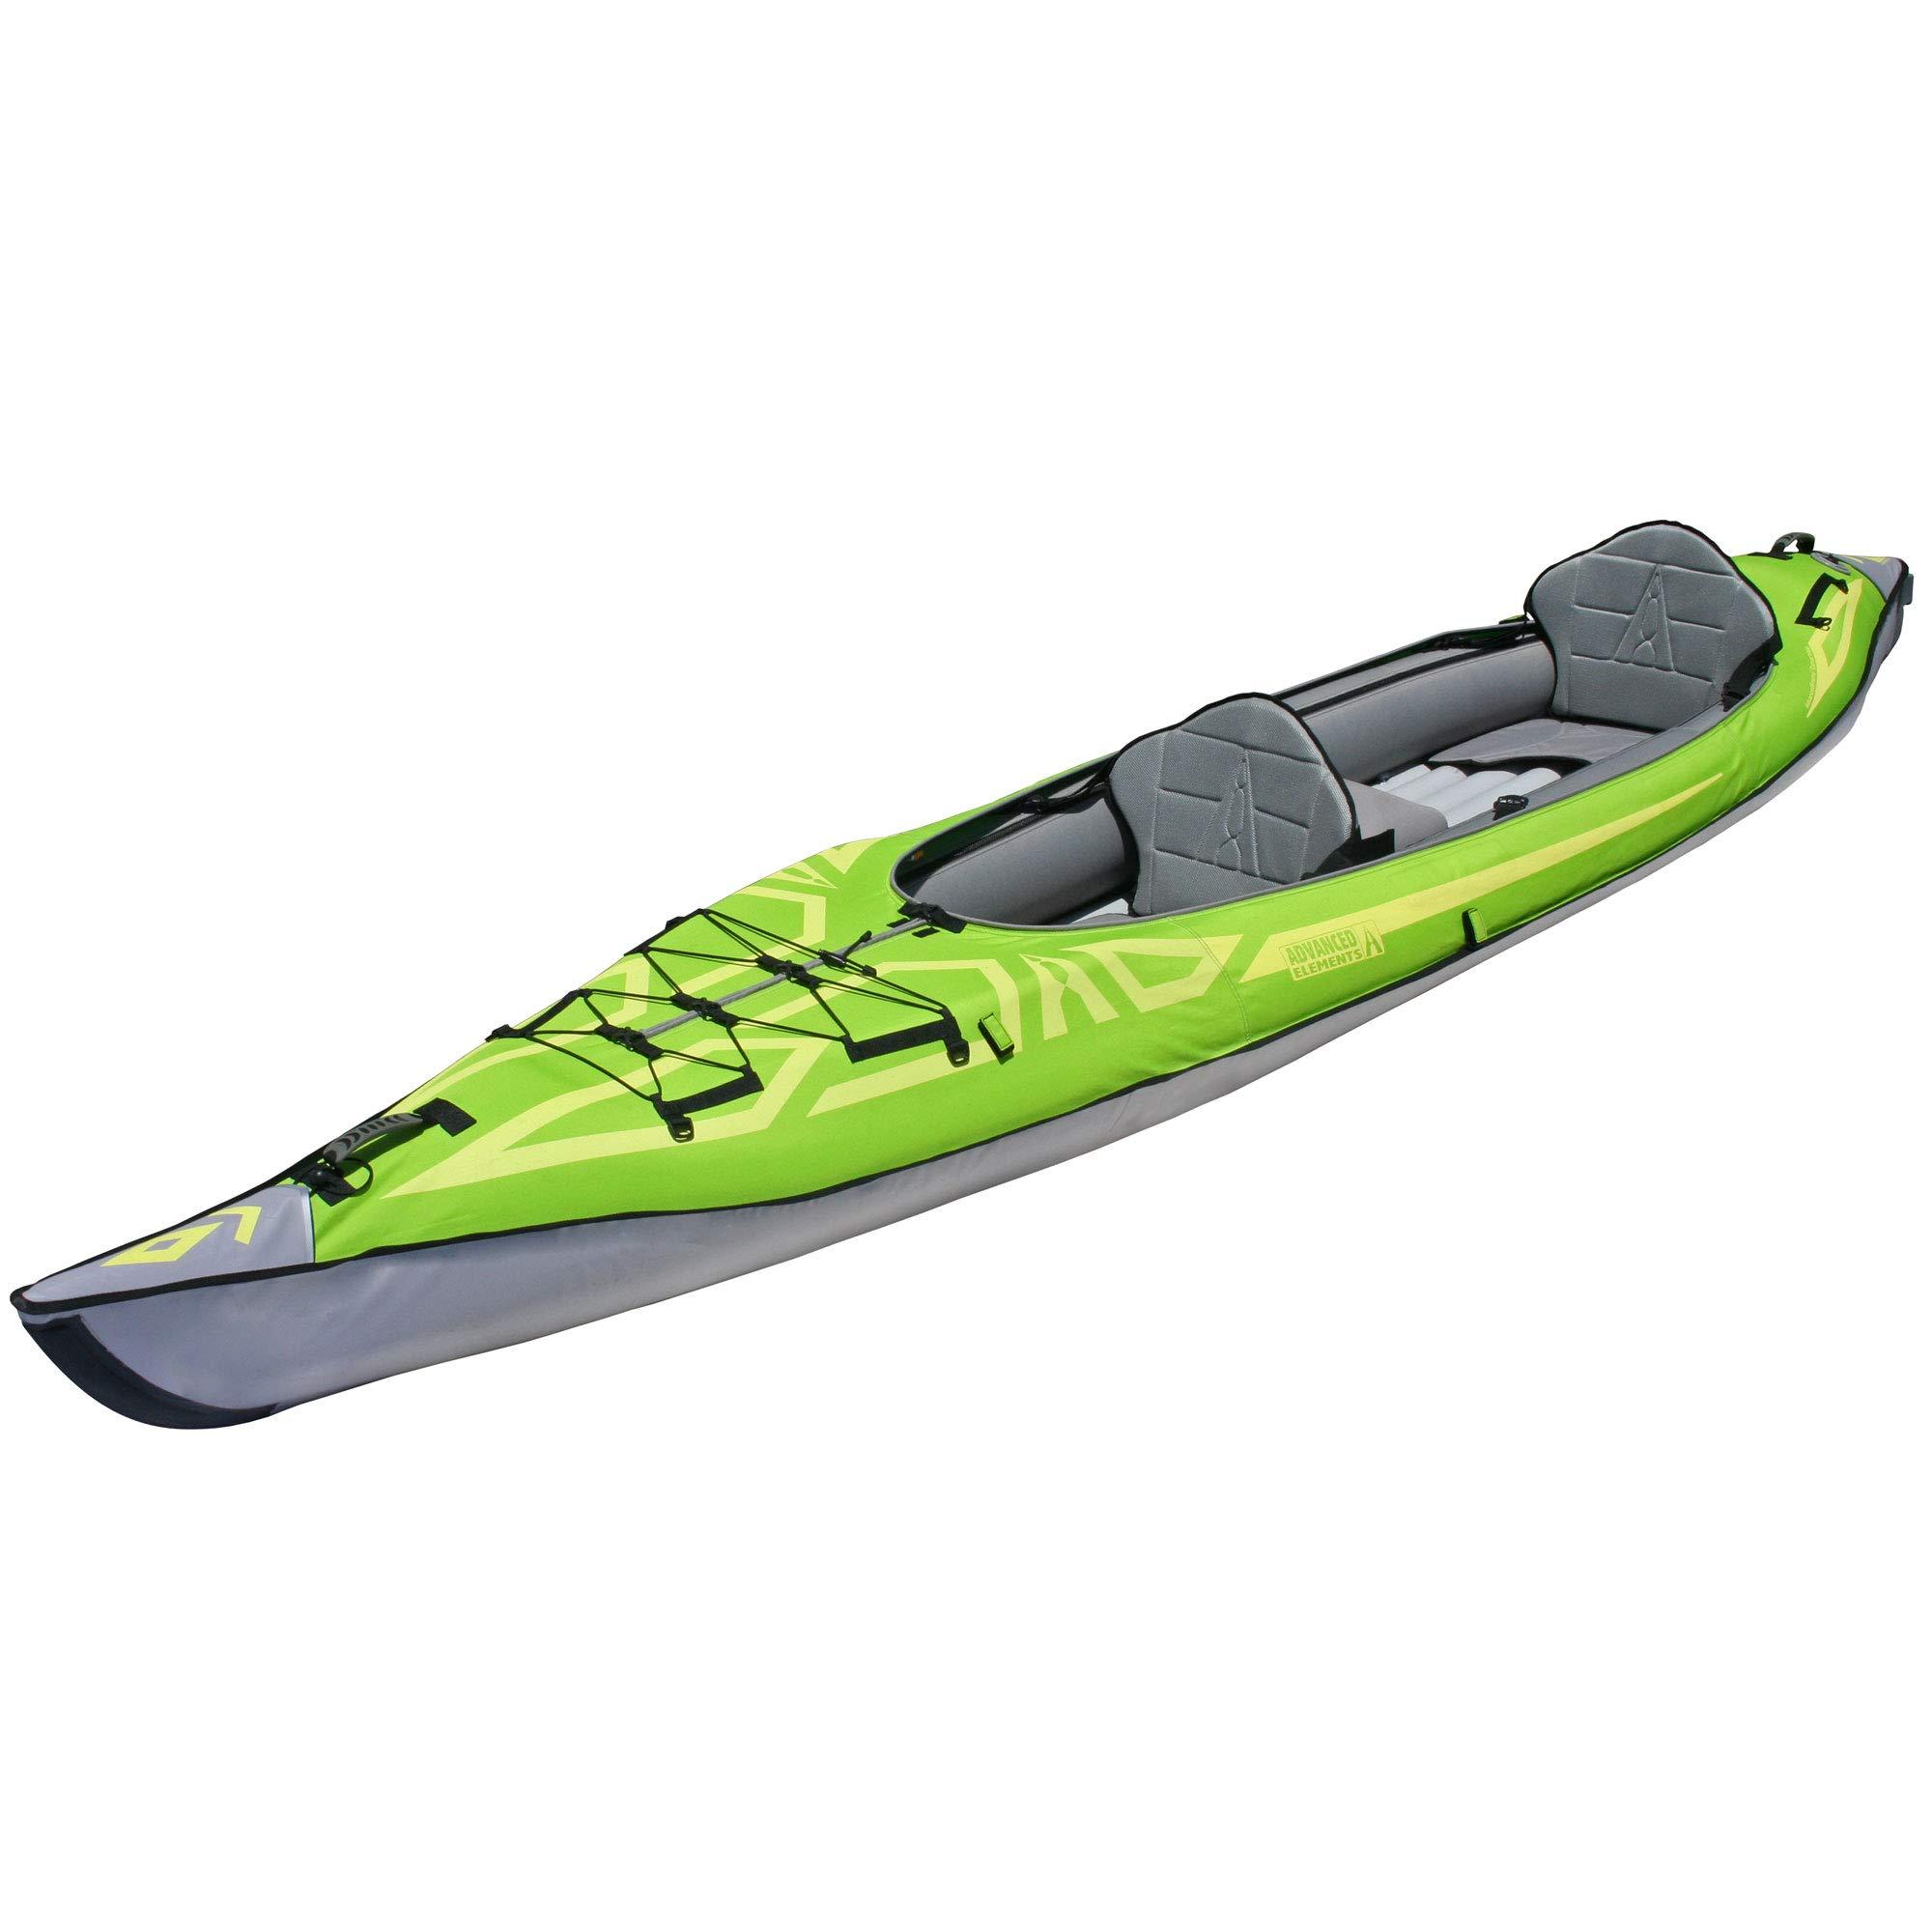 ADVANCED ELEMENTS AdvancedFrame Convertible Inflatable Kayak, Green